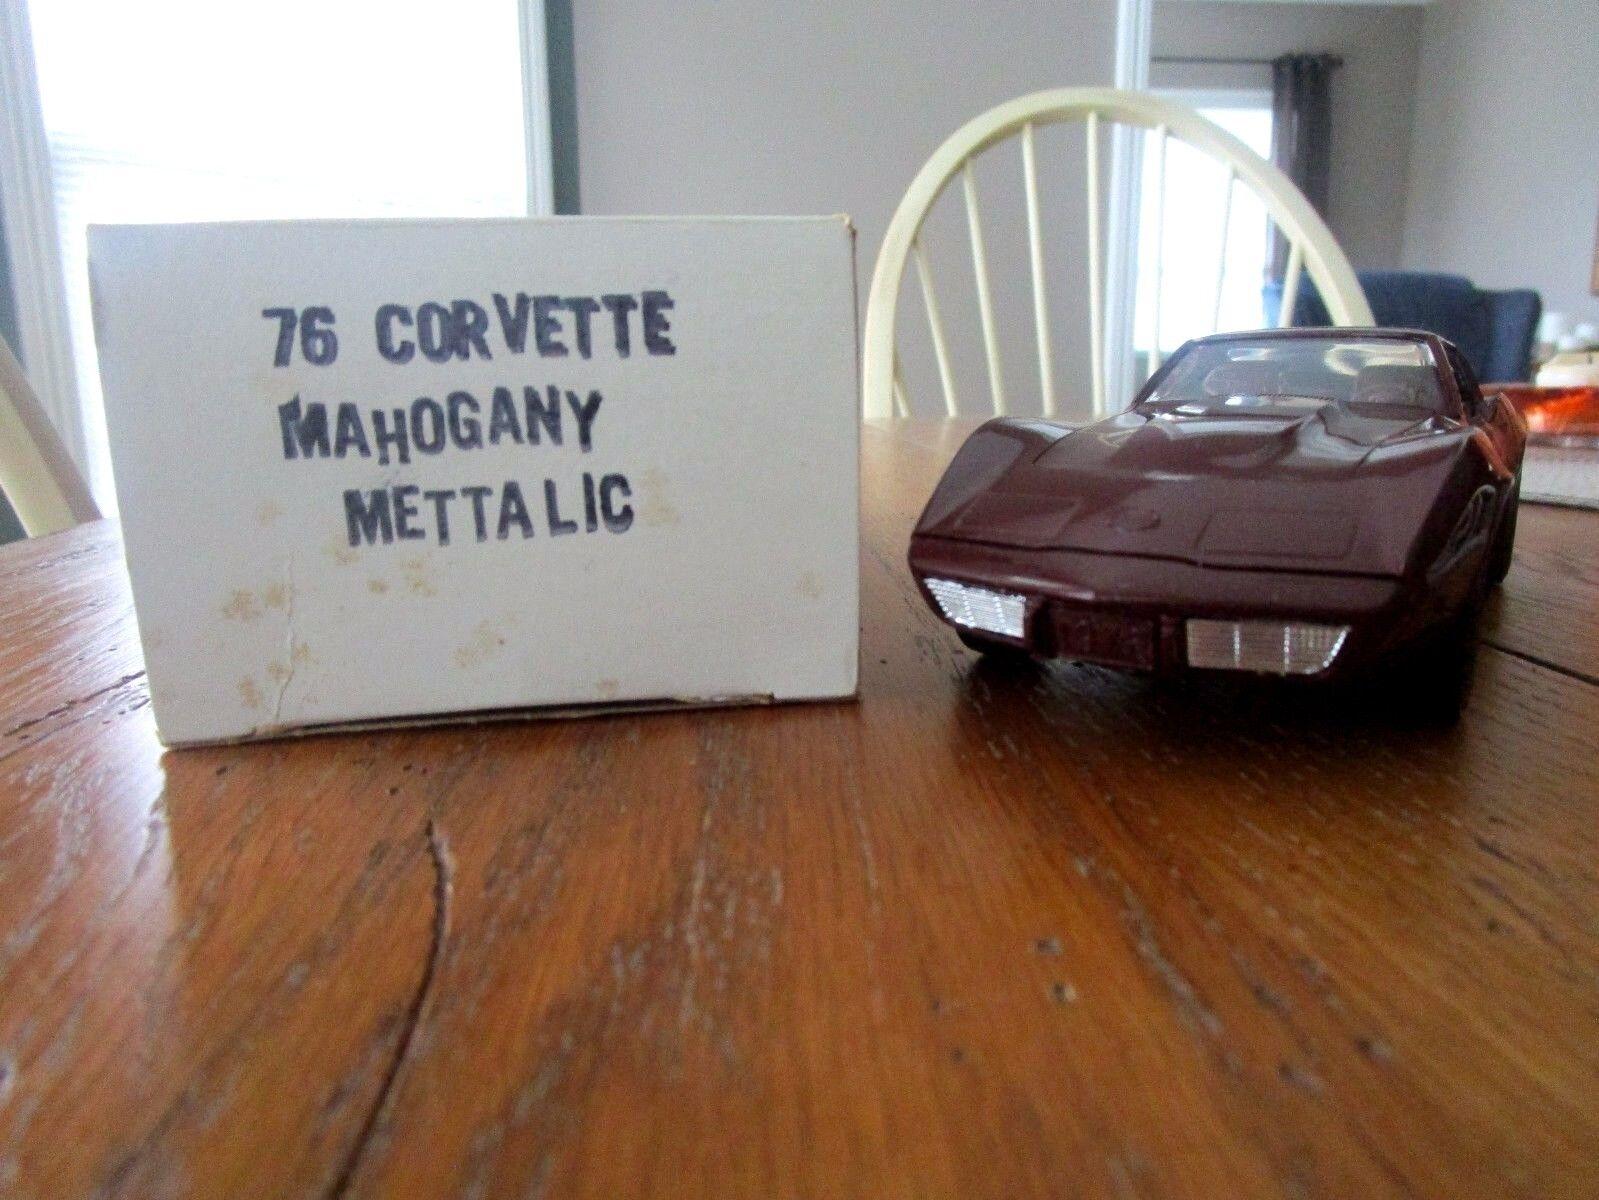 1976 Corvette Coupe GM Factory Original Promo Mahogany Metallic 1 25Th MIB